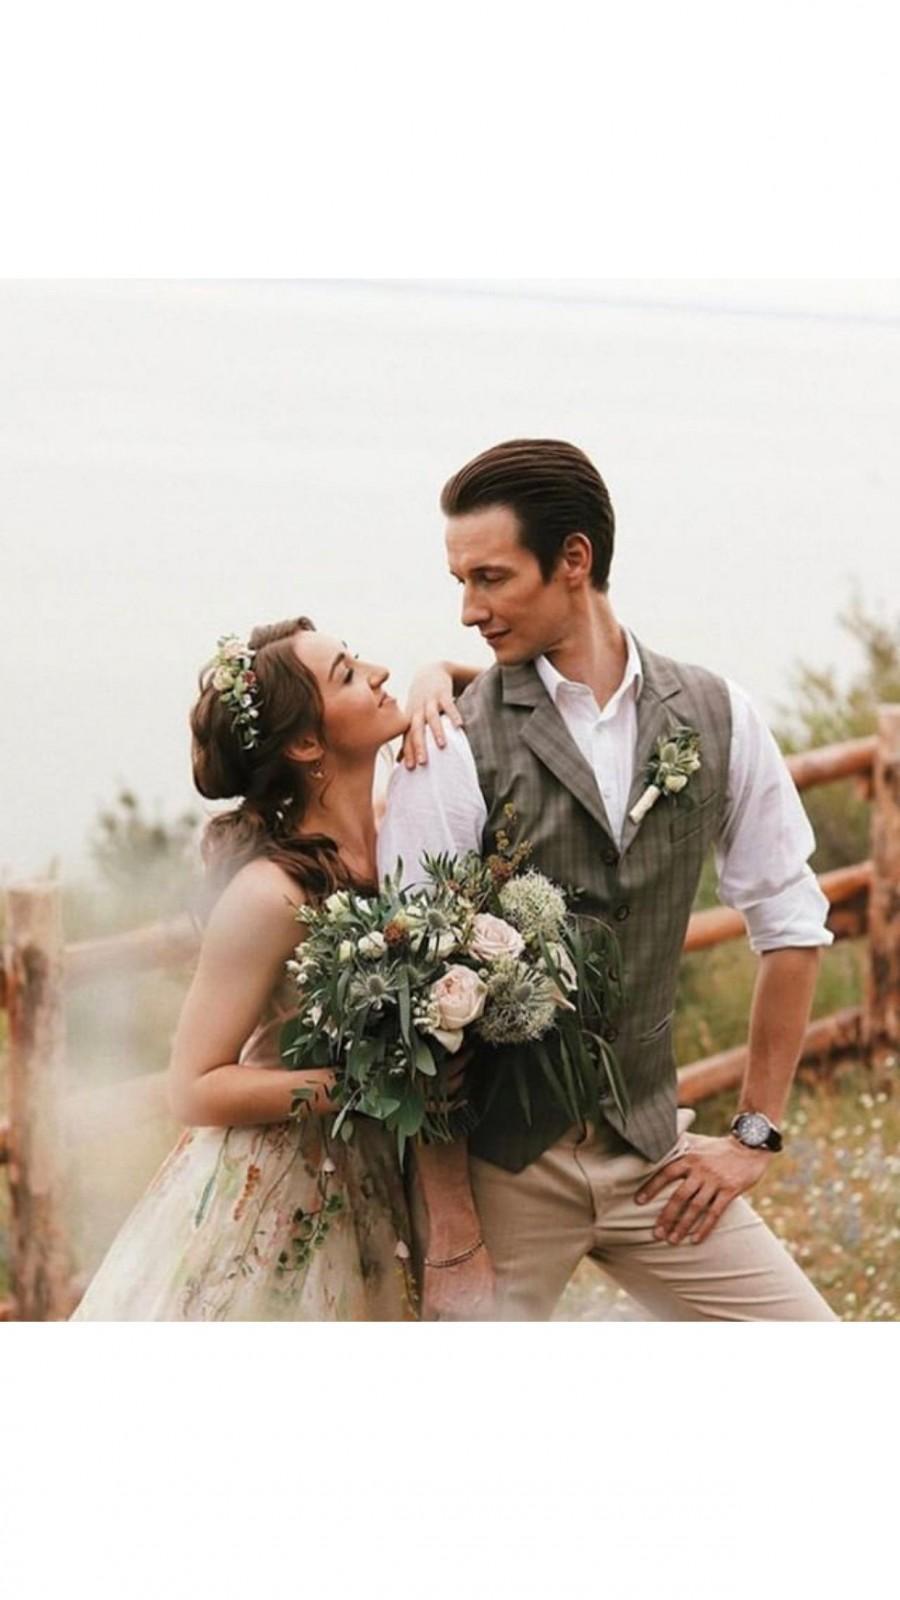 Wedding - Beige Flower crown, Ivory Bridal floral crown, Wedding floral crown, Bridal flower crown, Wedding hairpiece, Woodland wedding,Rustic wedding